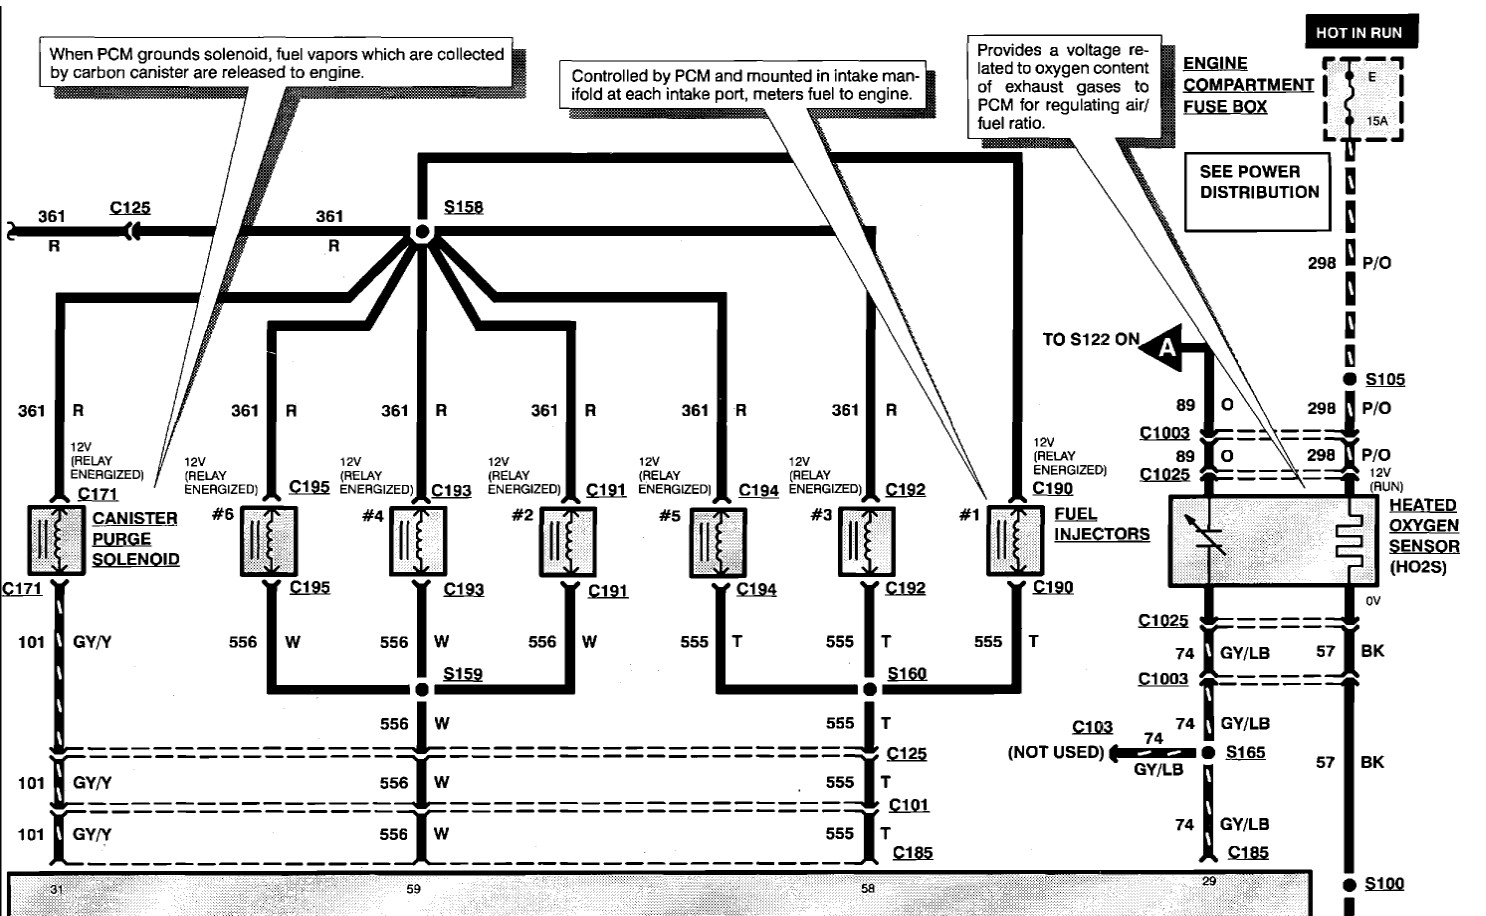 2013 03 04_140202_a1 wiring diagram 94 puma 94 engine diagram, 94 fuse diagram, 94 94 f150 wiring diagram at reclaimingppi.co